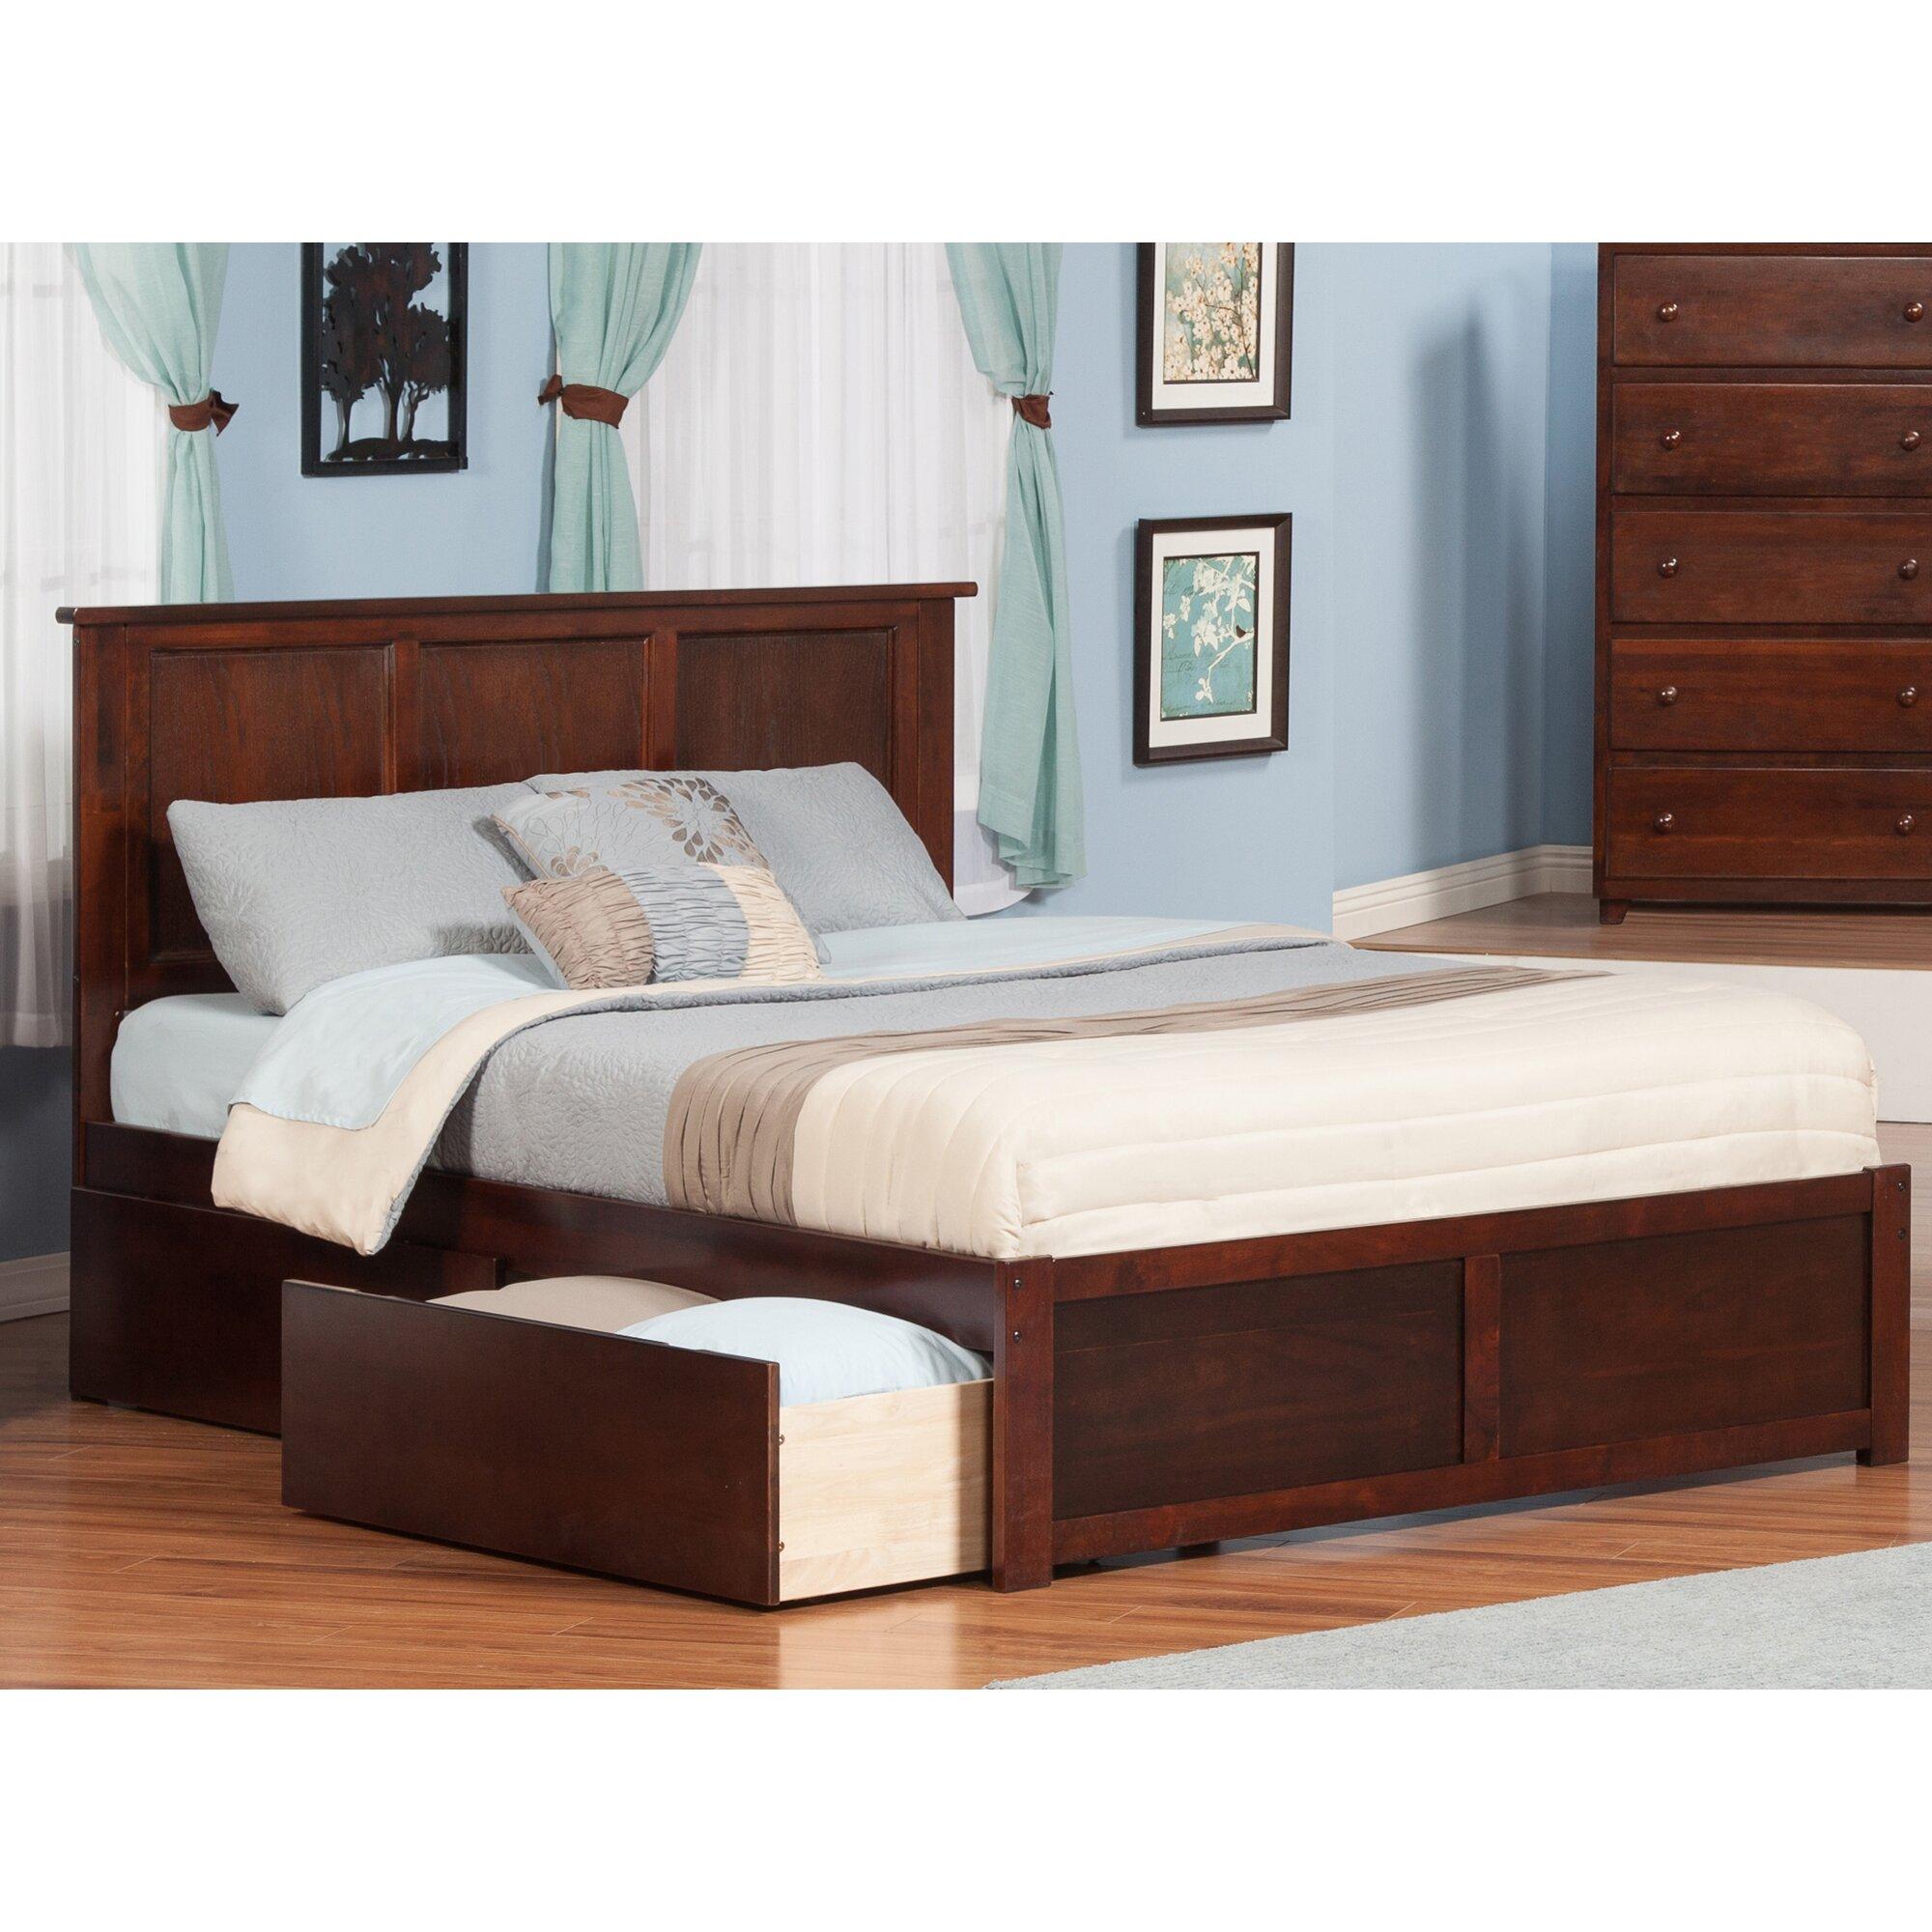 Viv rae greyson storage platform bed reviews wayfair - Platform bedroom sets with storage ...